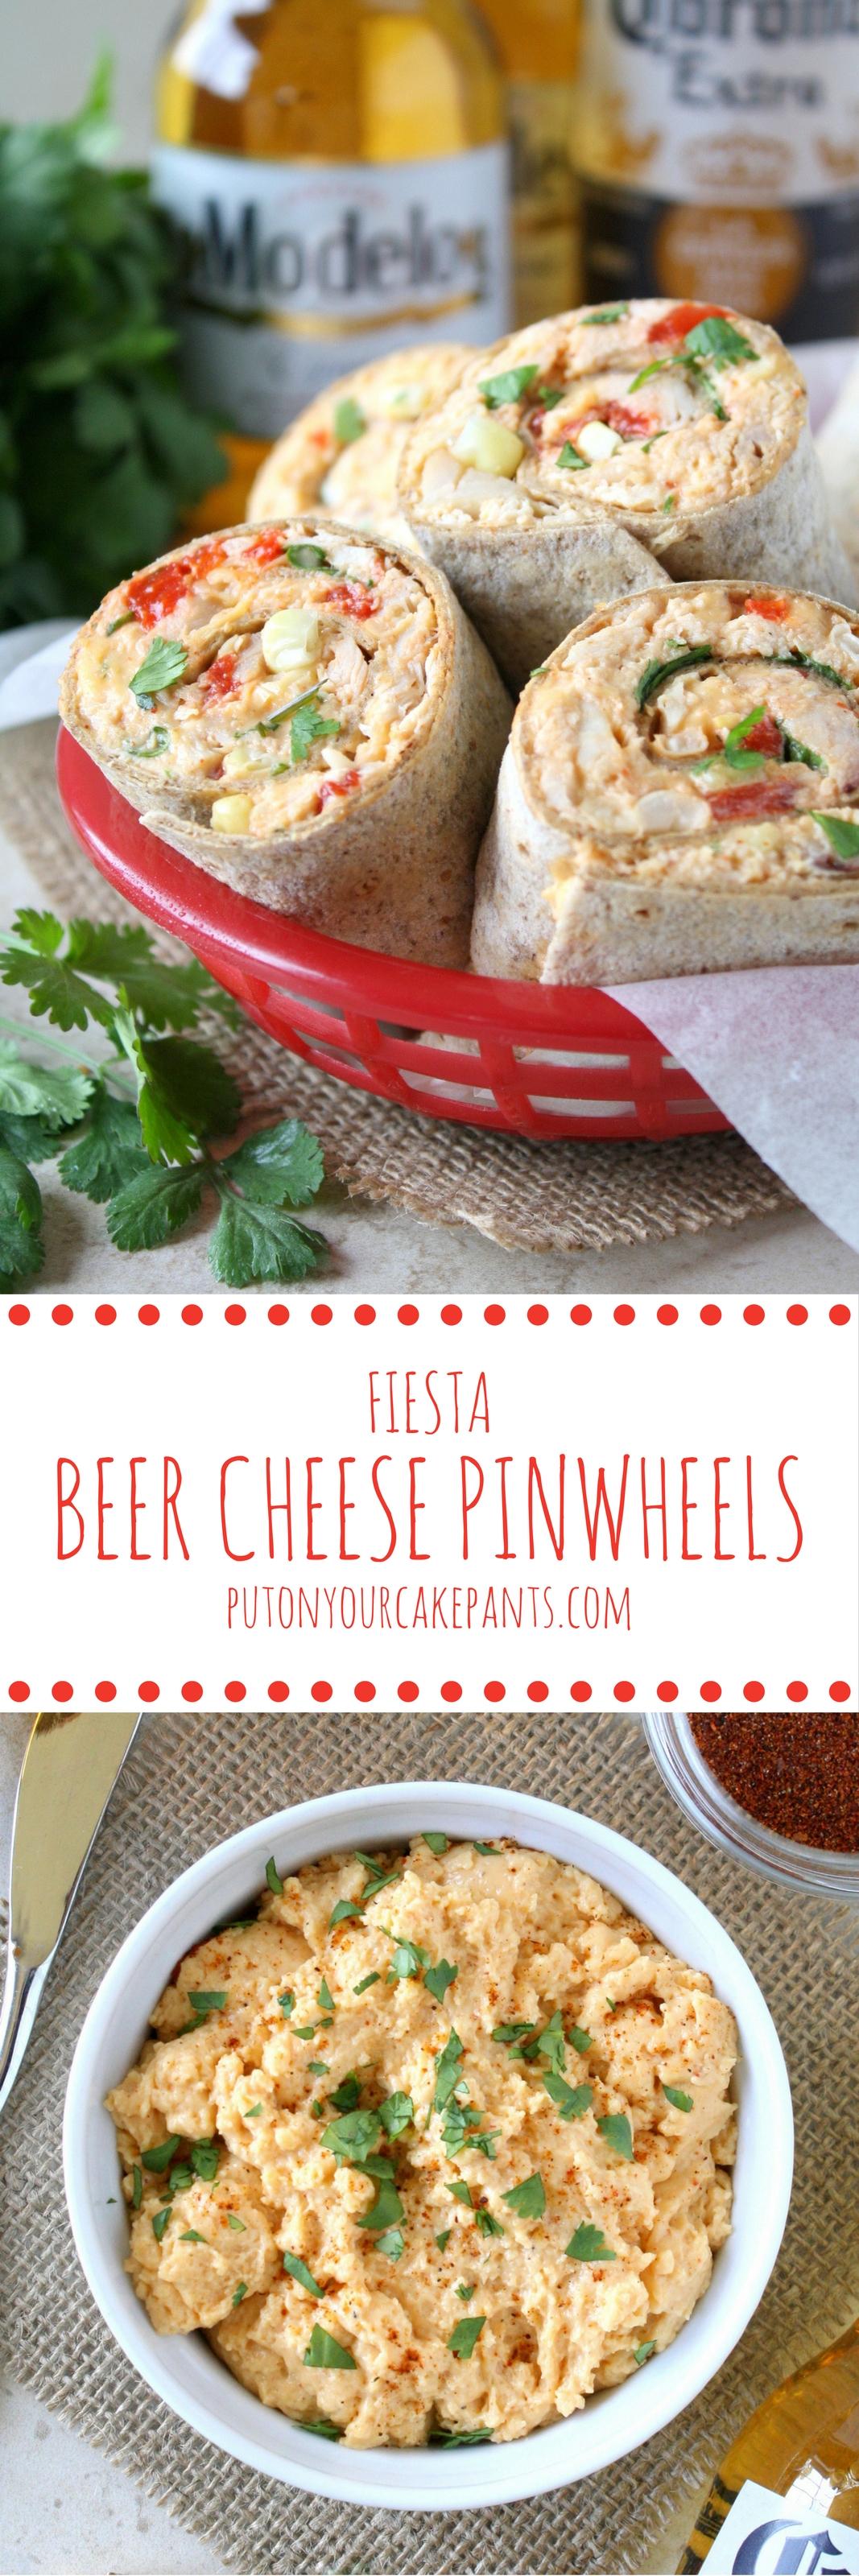 fiesta beer cheese pinwheels #CervezaCelebration #shop